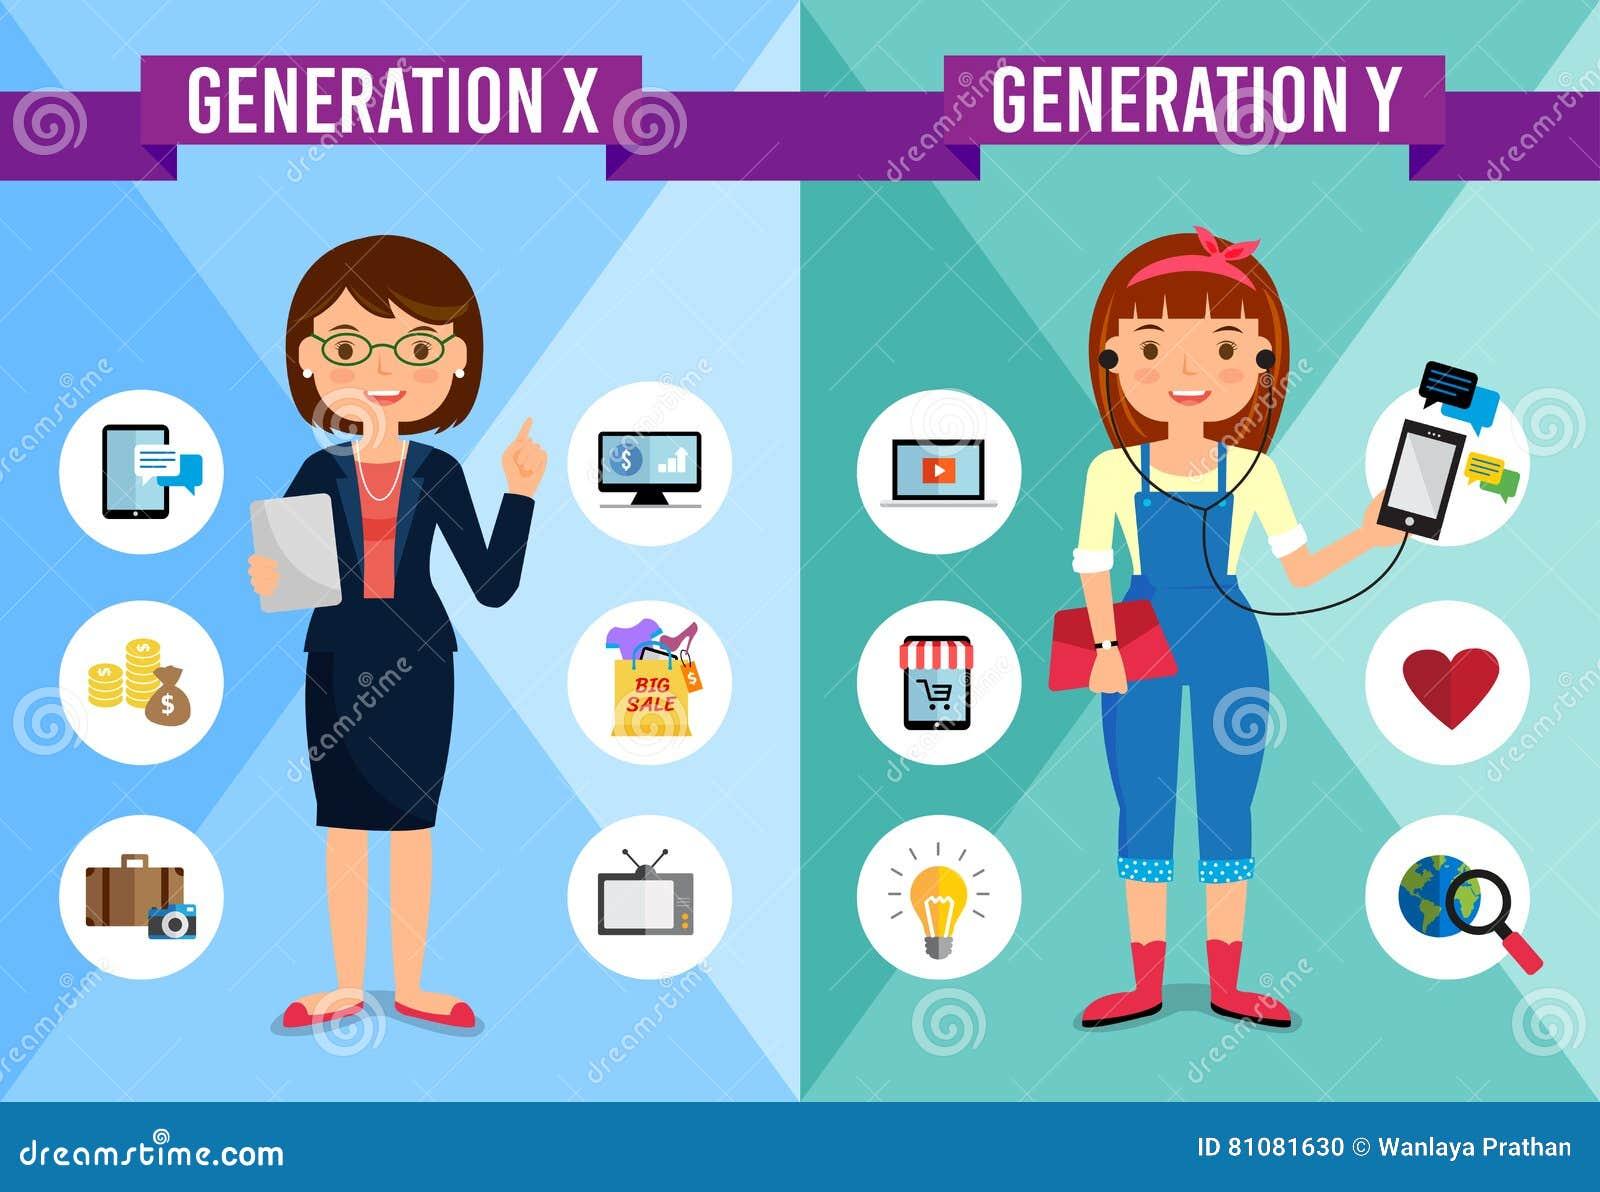 generation x generation y cartoon character stock vector generation x generation y cartoon character stock photo